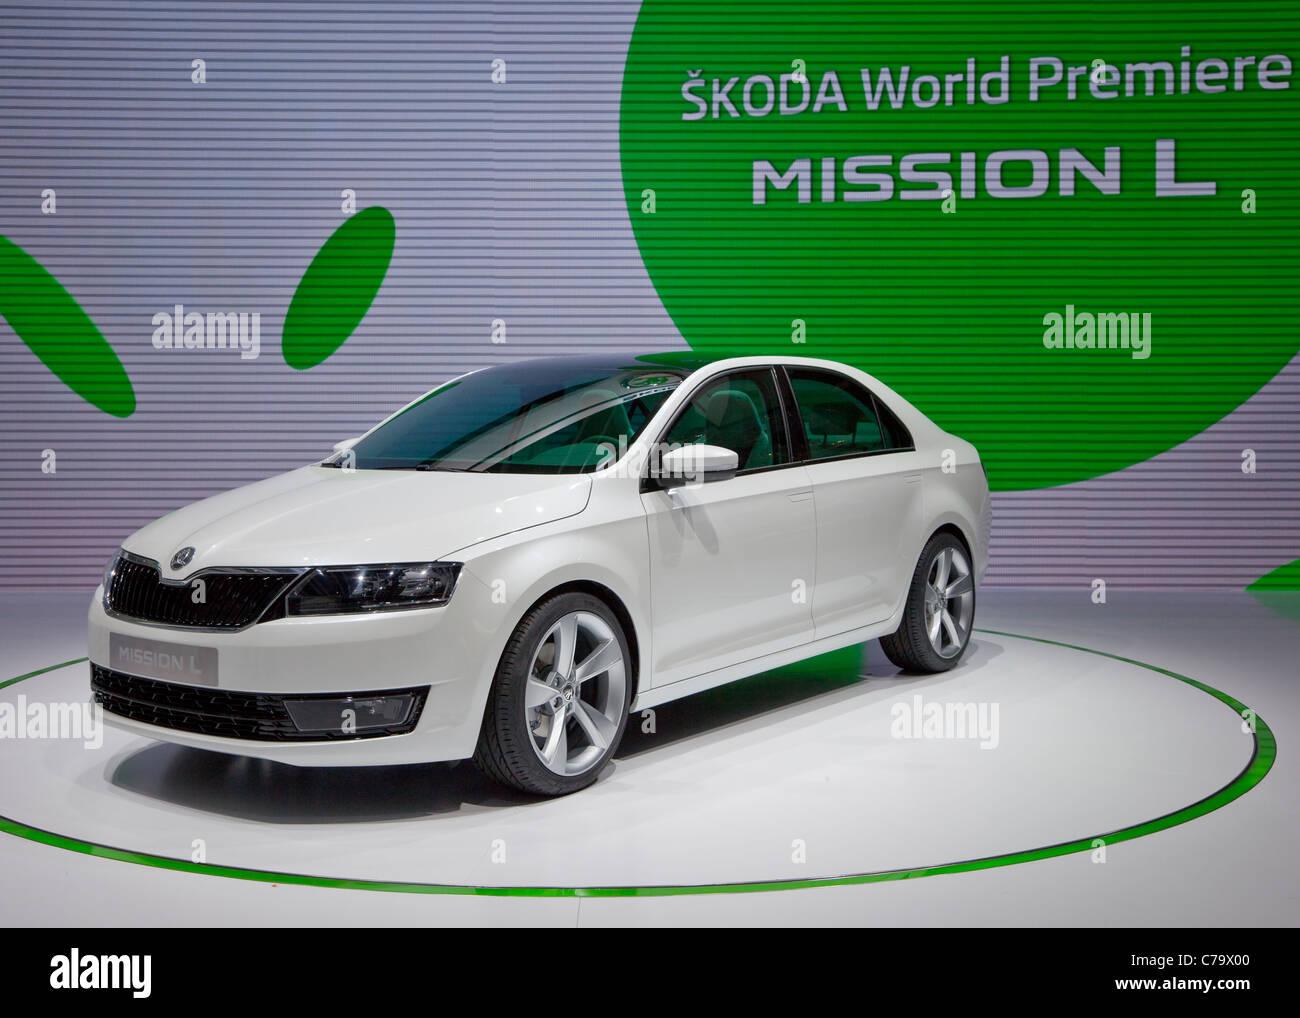 Skoda Mission L on the IAA 2011, International Motor Show in Frankfurt am Main, Germany, Europe - Stock Image